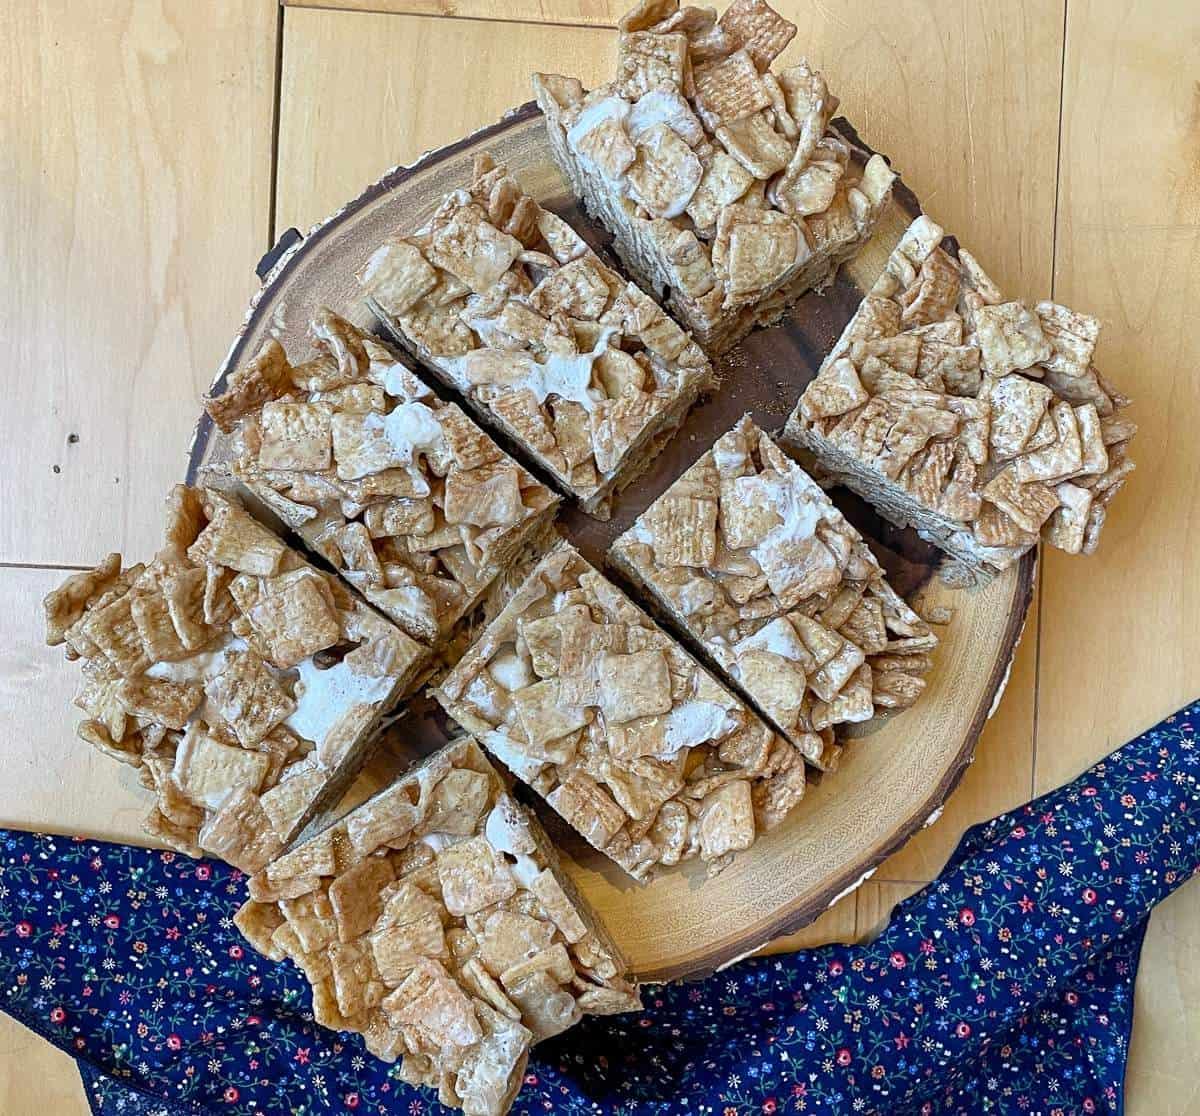 Cinnamon Toast Crunch Cereal Treats on a wood board.